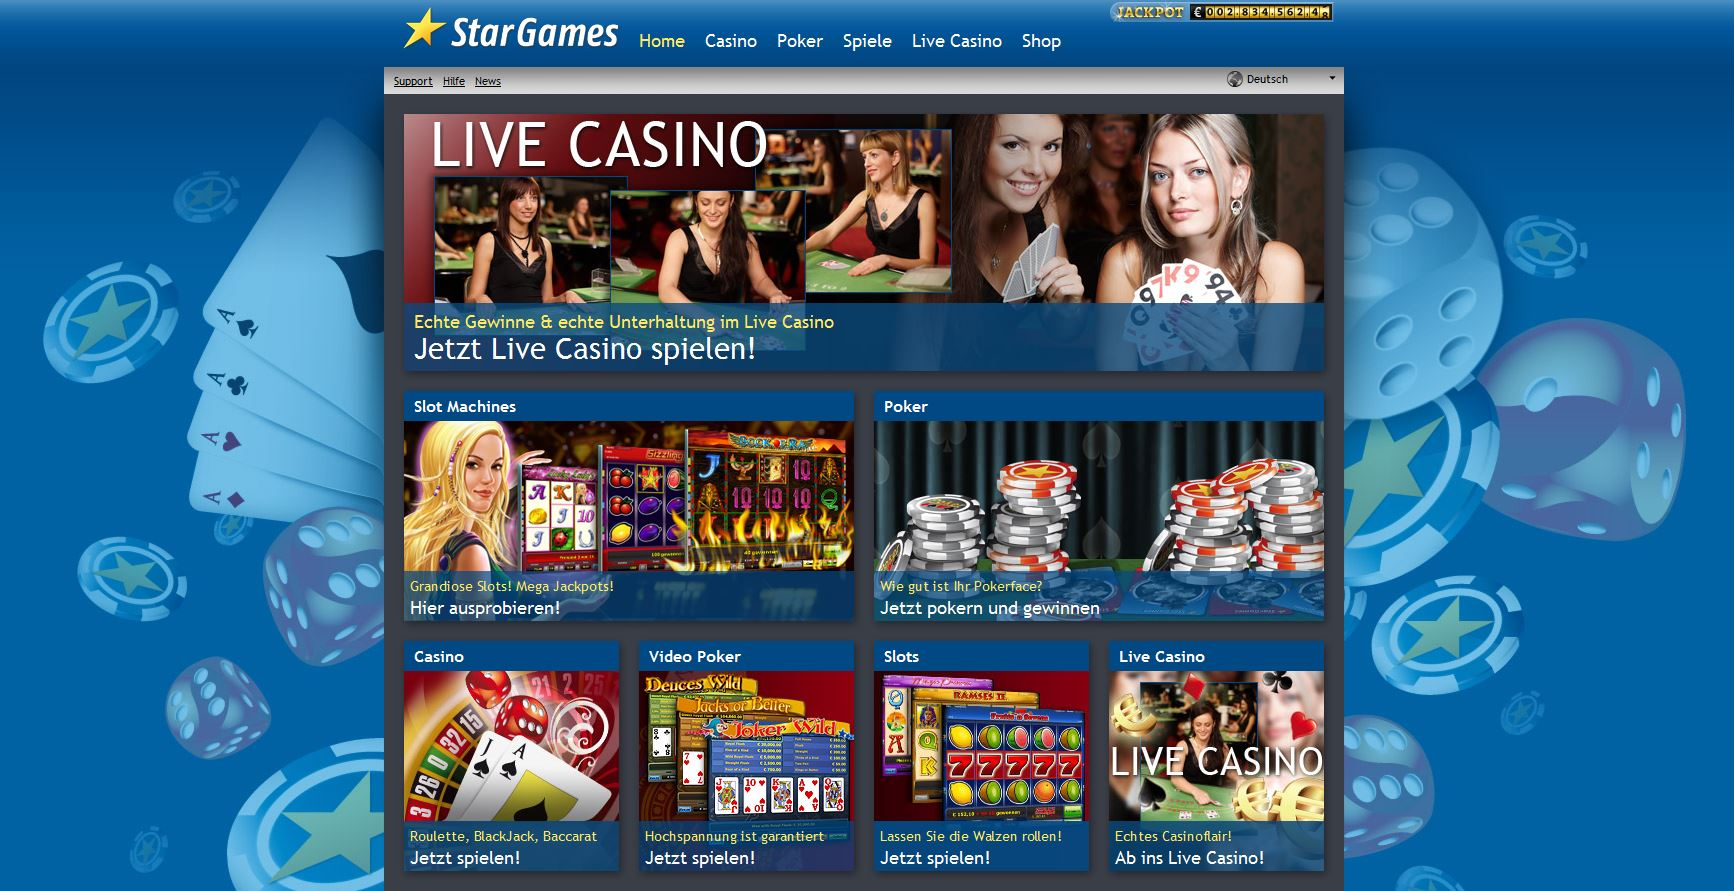 Stargames Online Casino